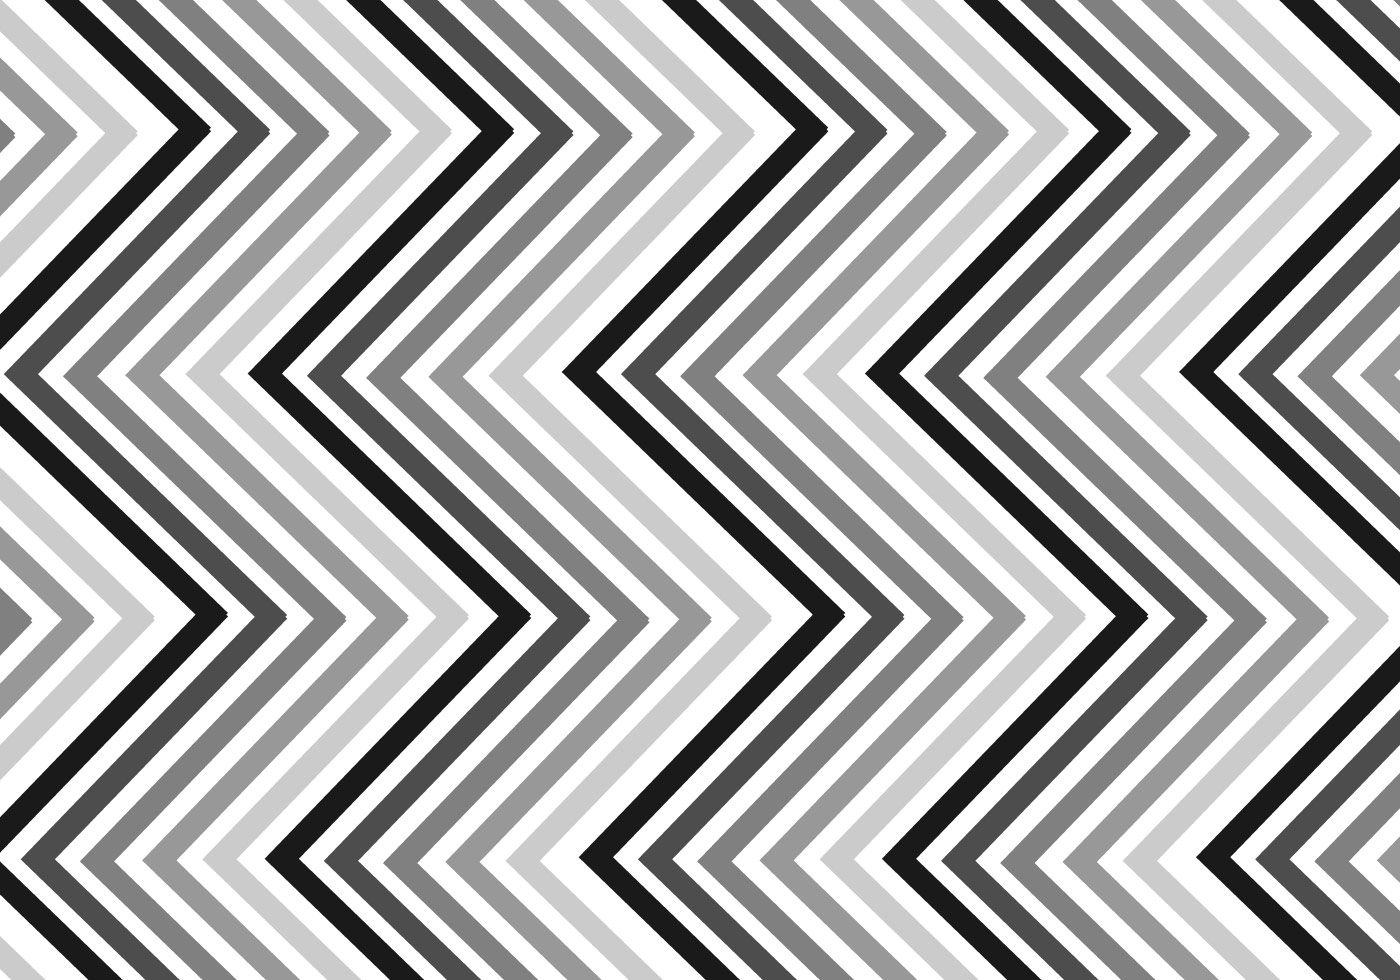 Line Texture Design : Seamless line pattern download free vector art stock